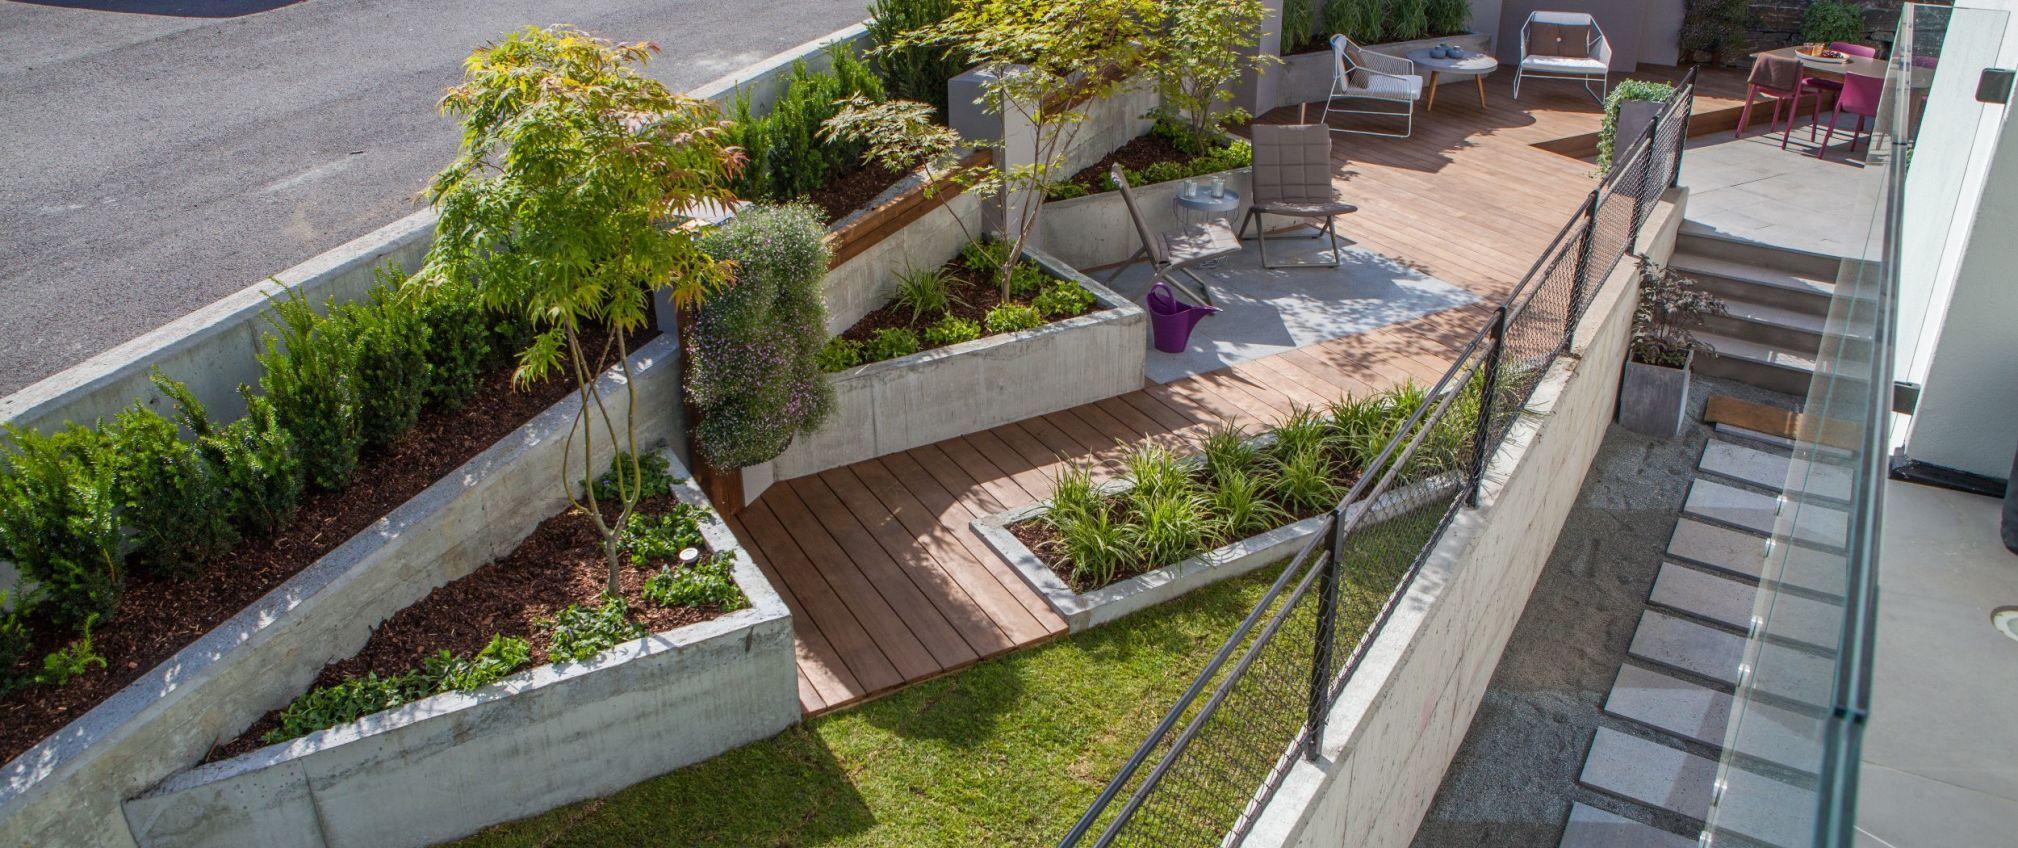 Photo of Slik forvandlet «Tid for hjem» steinørkenen til en hage